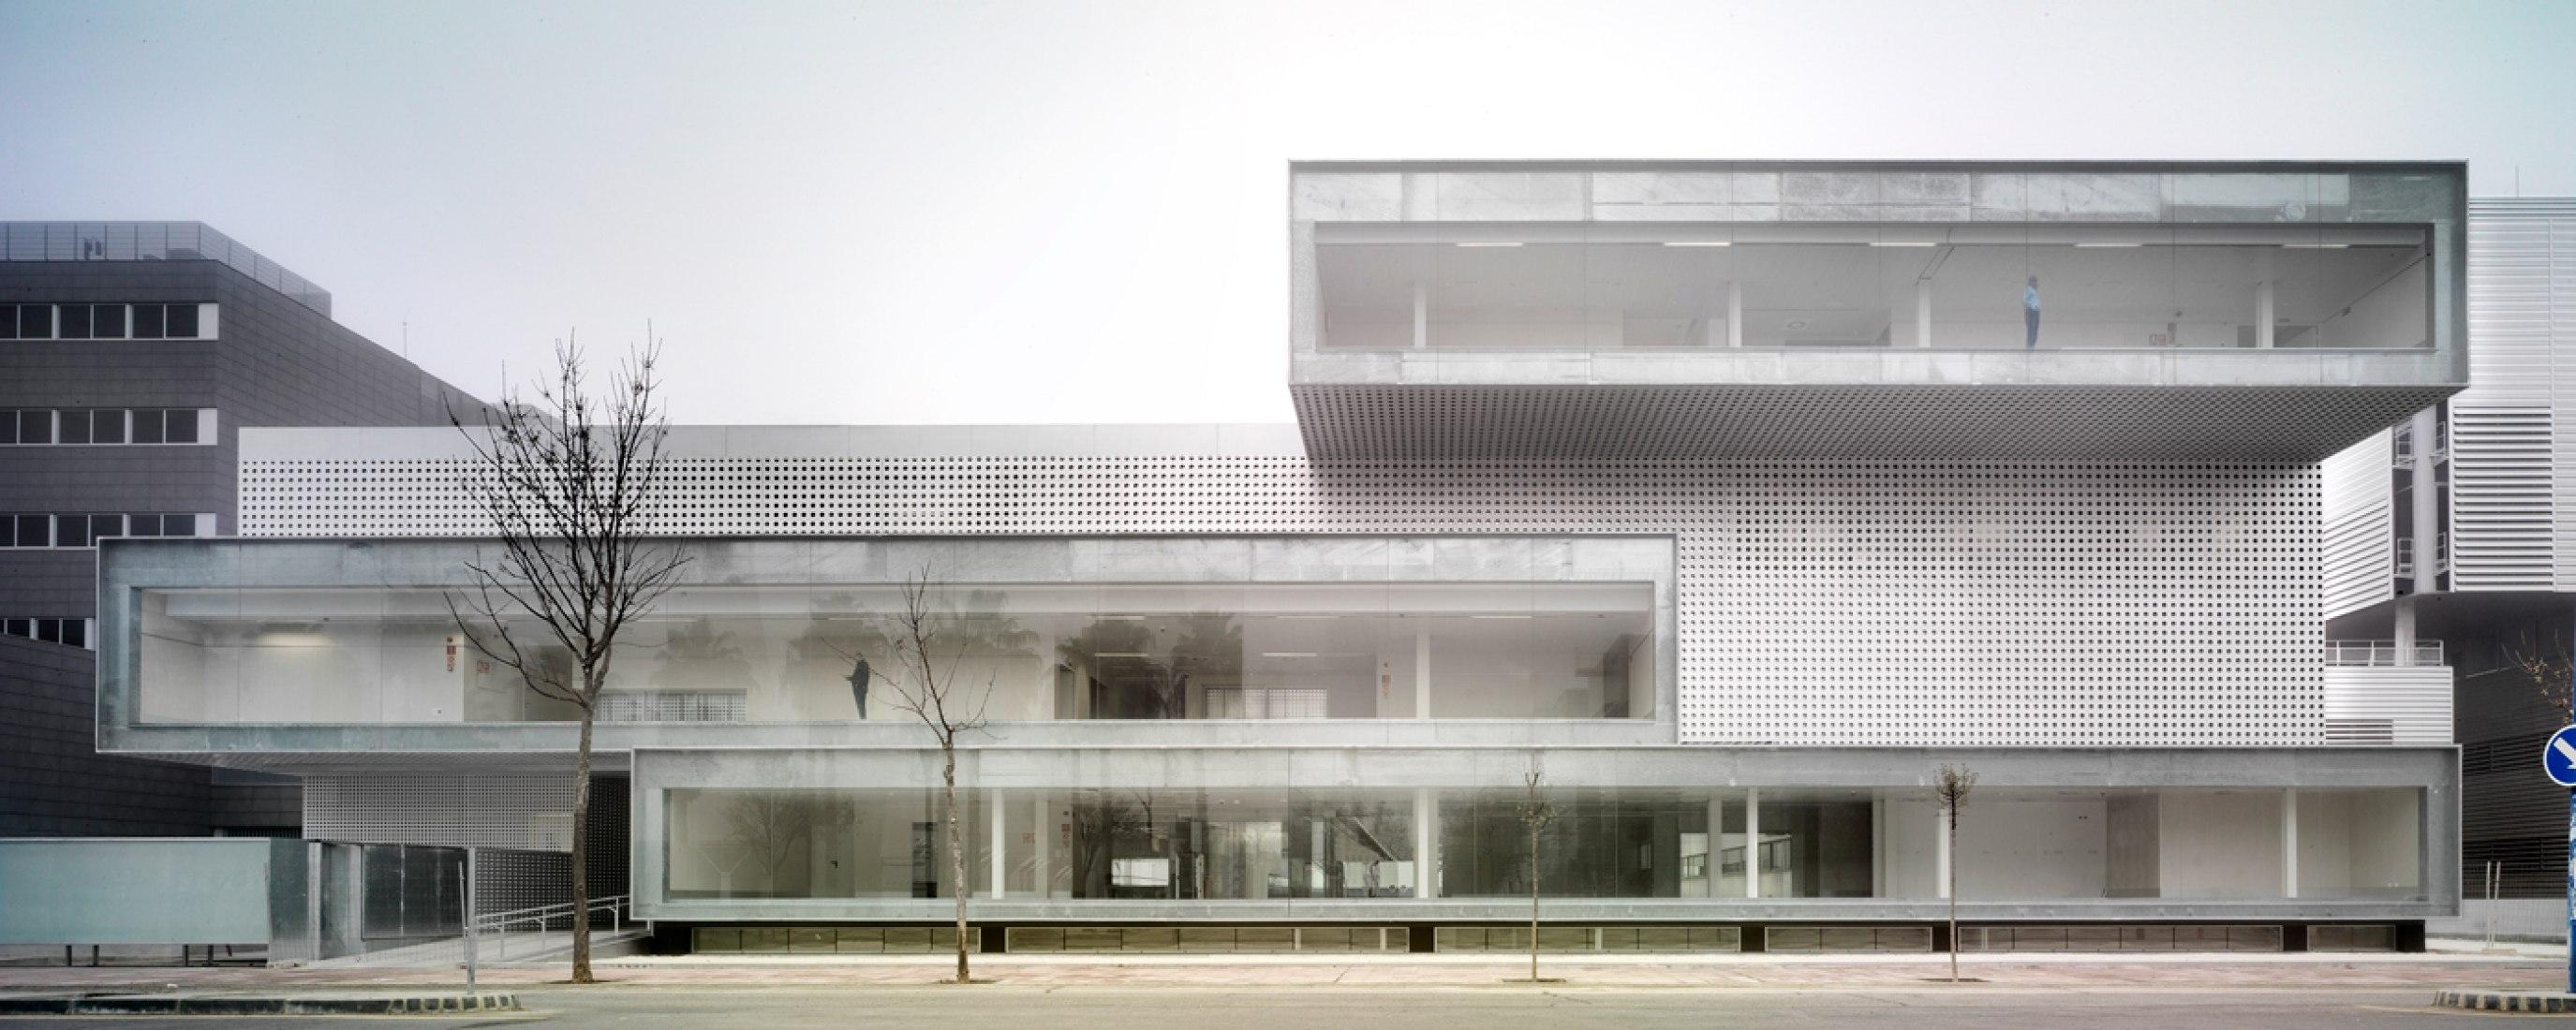 ICTAM Hospital. Cartuja Institute of Advanced Techniques in Medicine, MGM Architects, Sevilla, 2012. Photography © Jesús Granada.